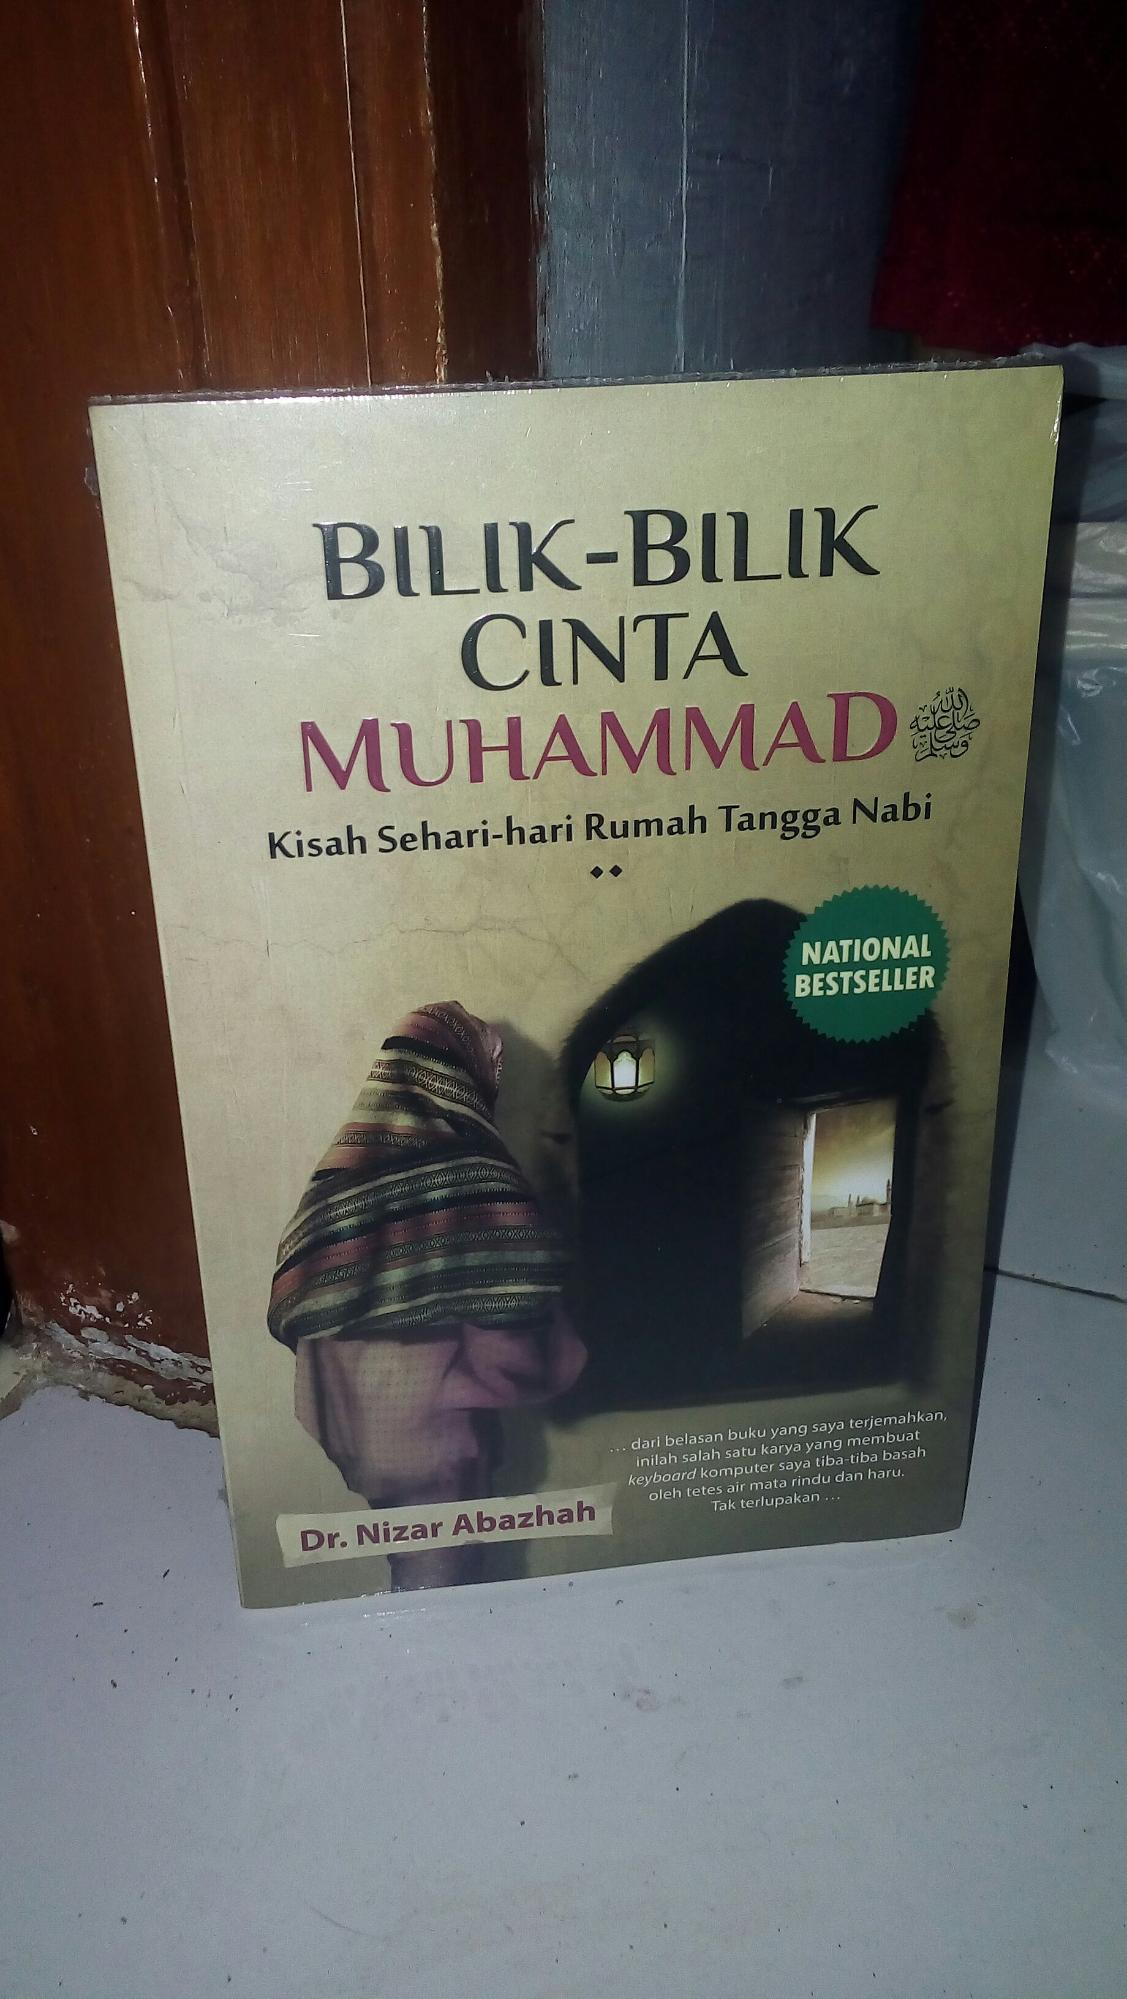 Bilik Bilik Cinta Muhammad